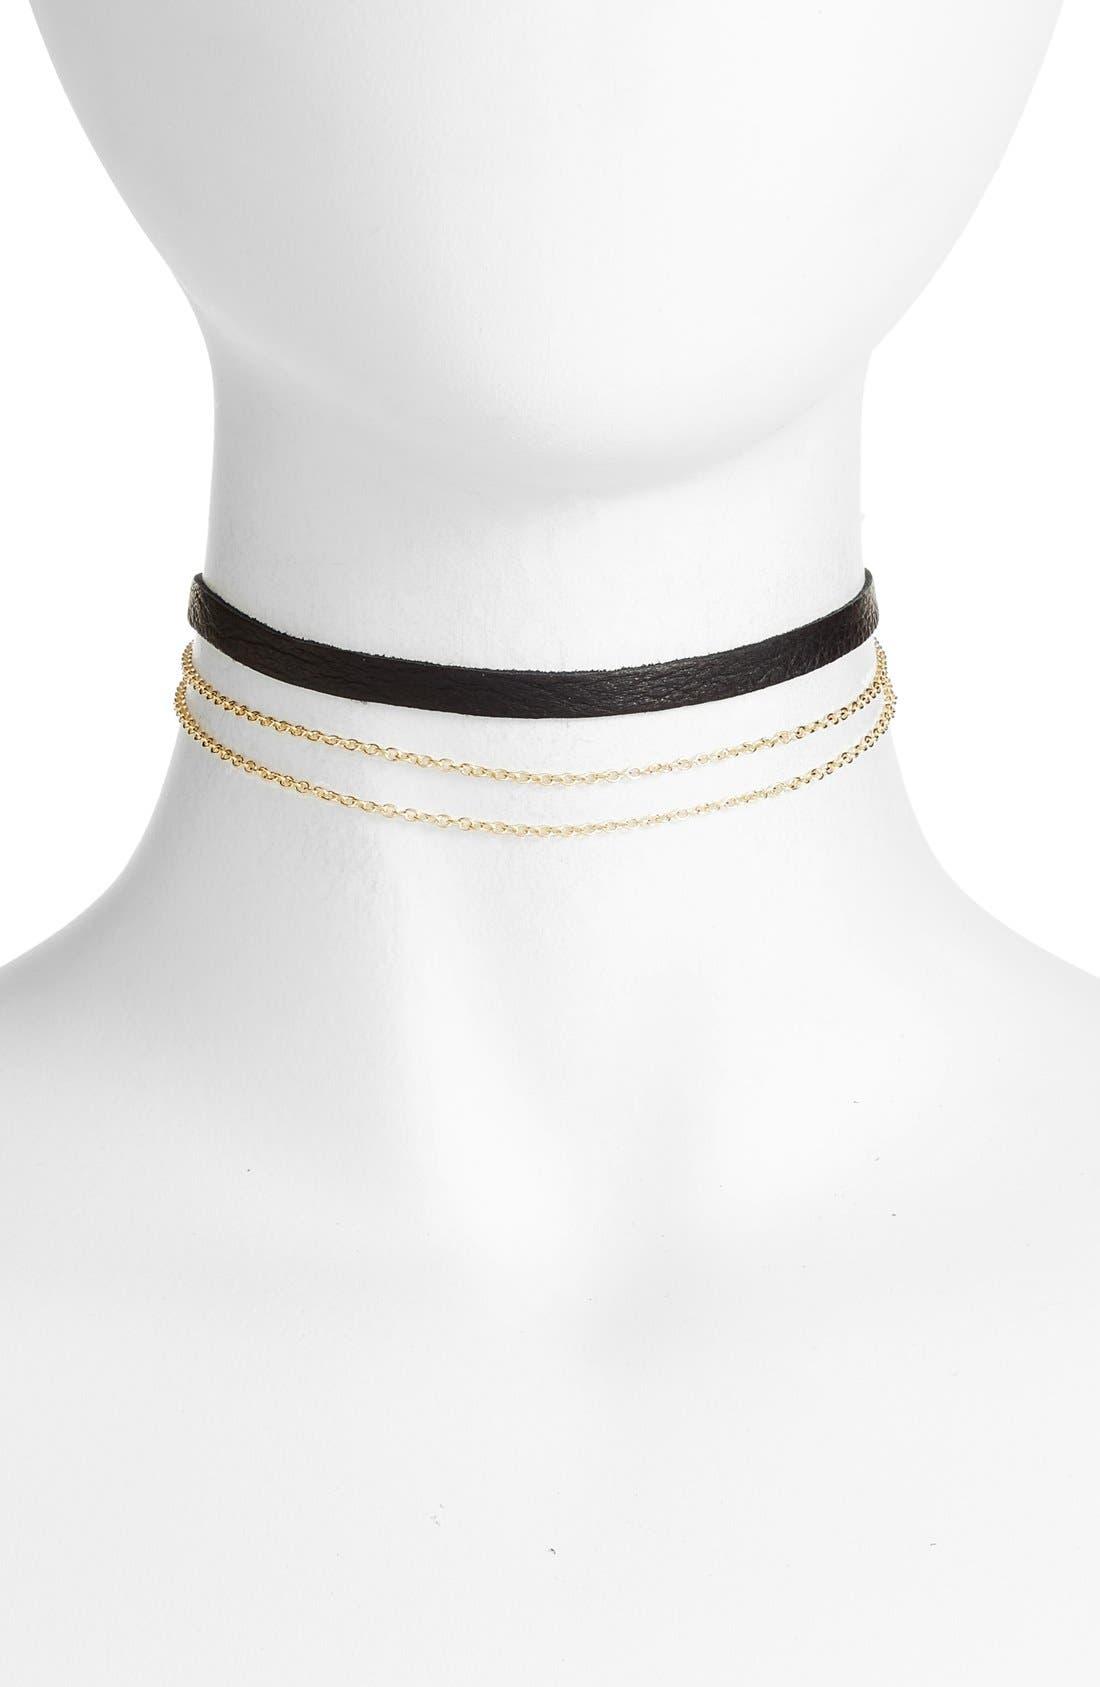 Leather & Chain Choker,                         Main,                         color, Black